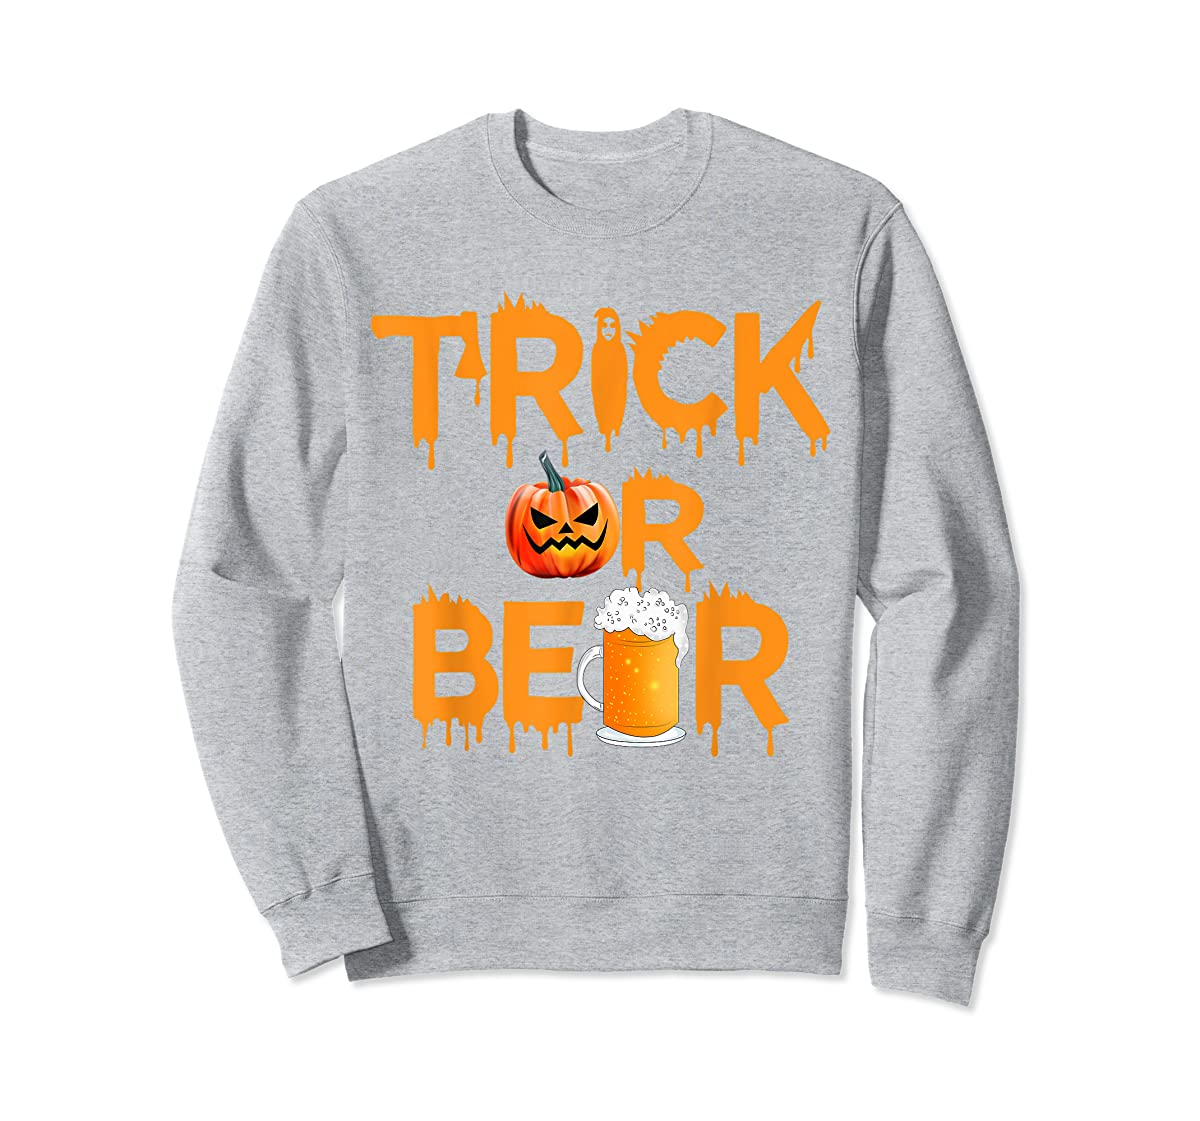 Halloween Costume Trick or Beer Drinking T Shirt Pumpkin Men T-Shirt-Sweatshirt-Sport Grey